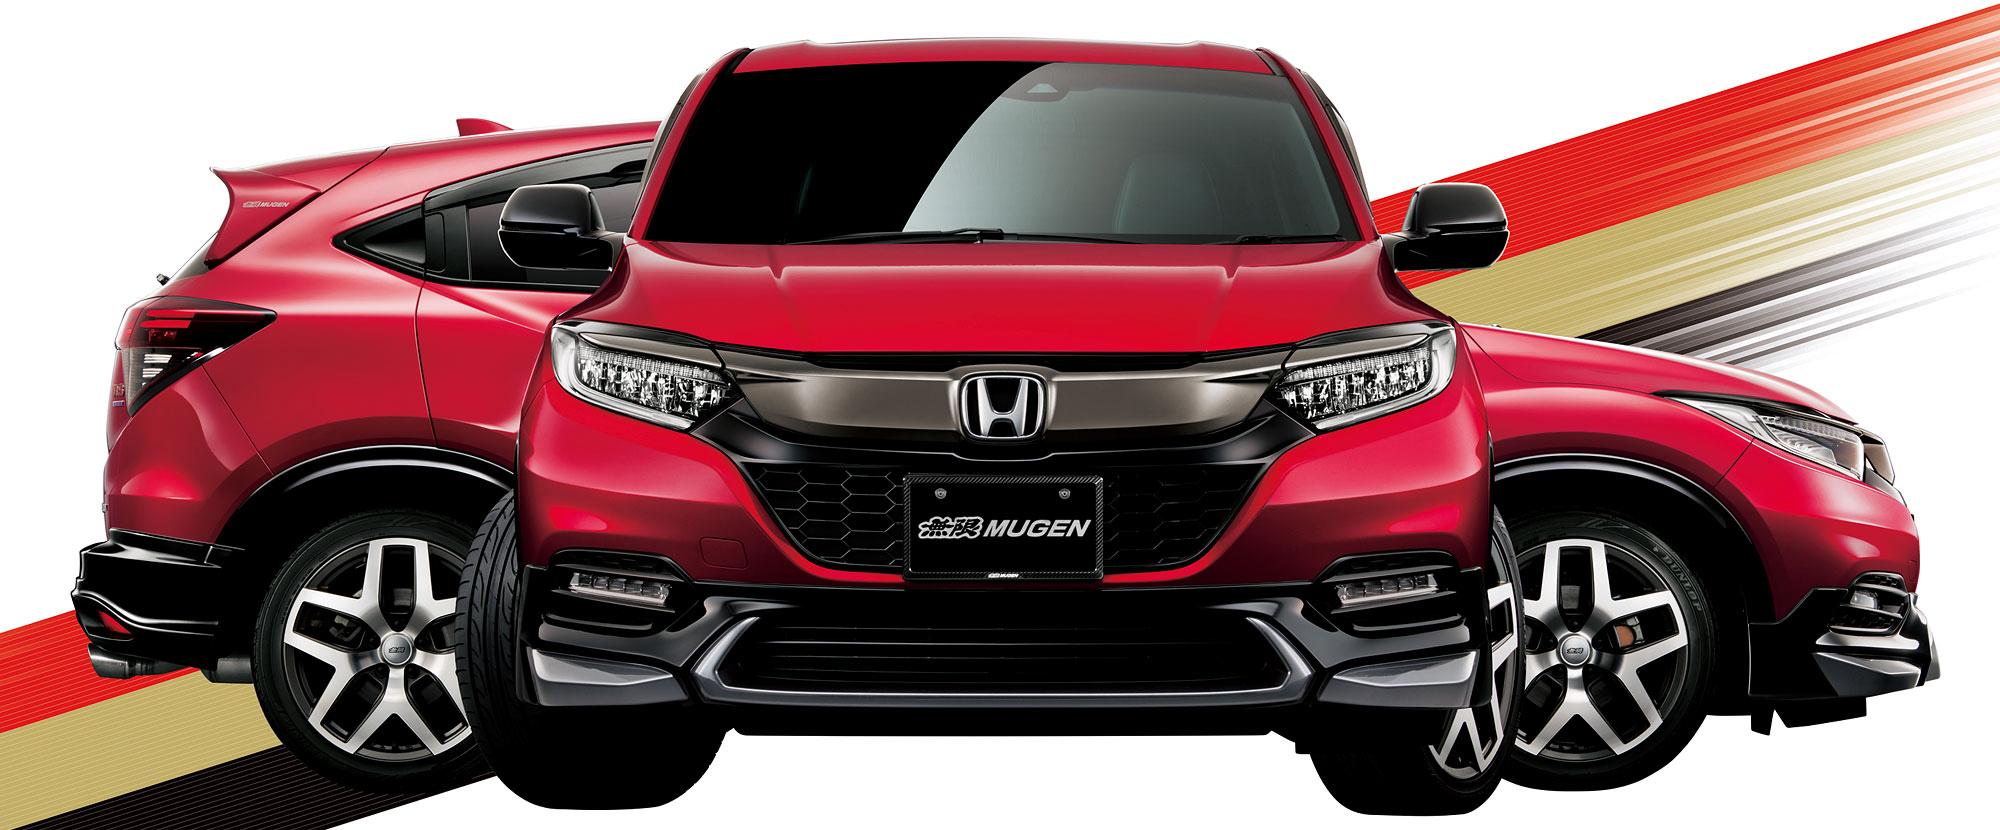 2018 Honda HR-V facelift gets Mugen and Modulo kits Paul ...